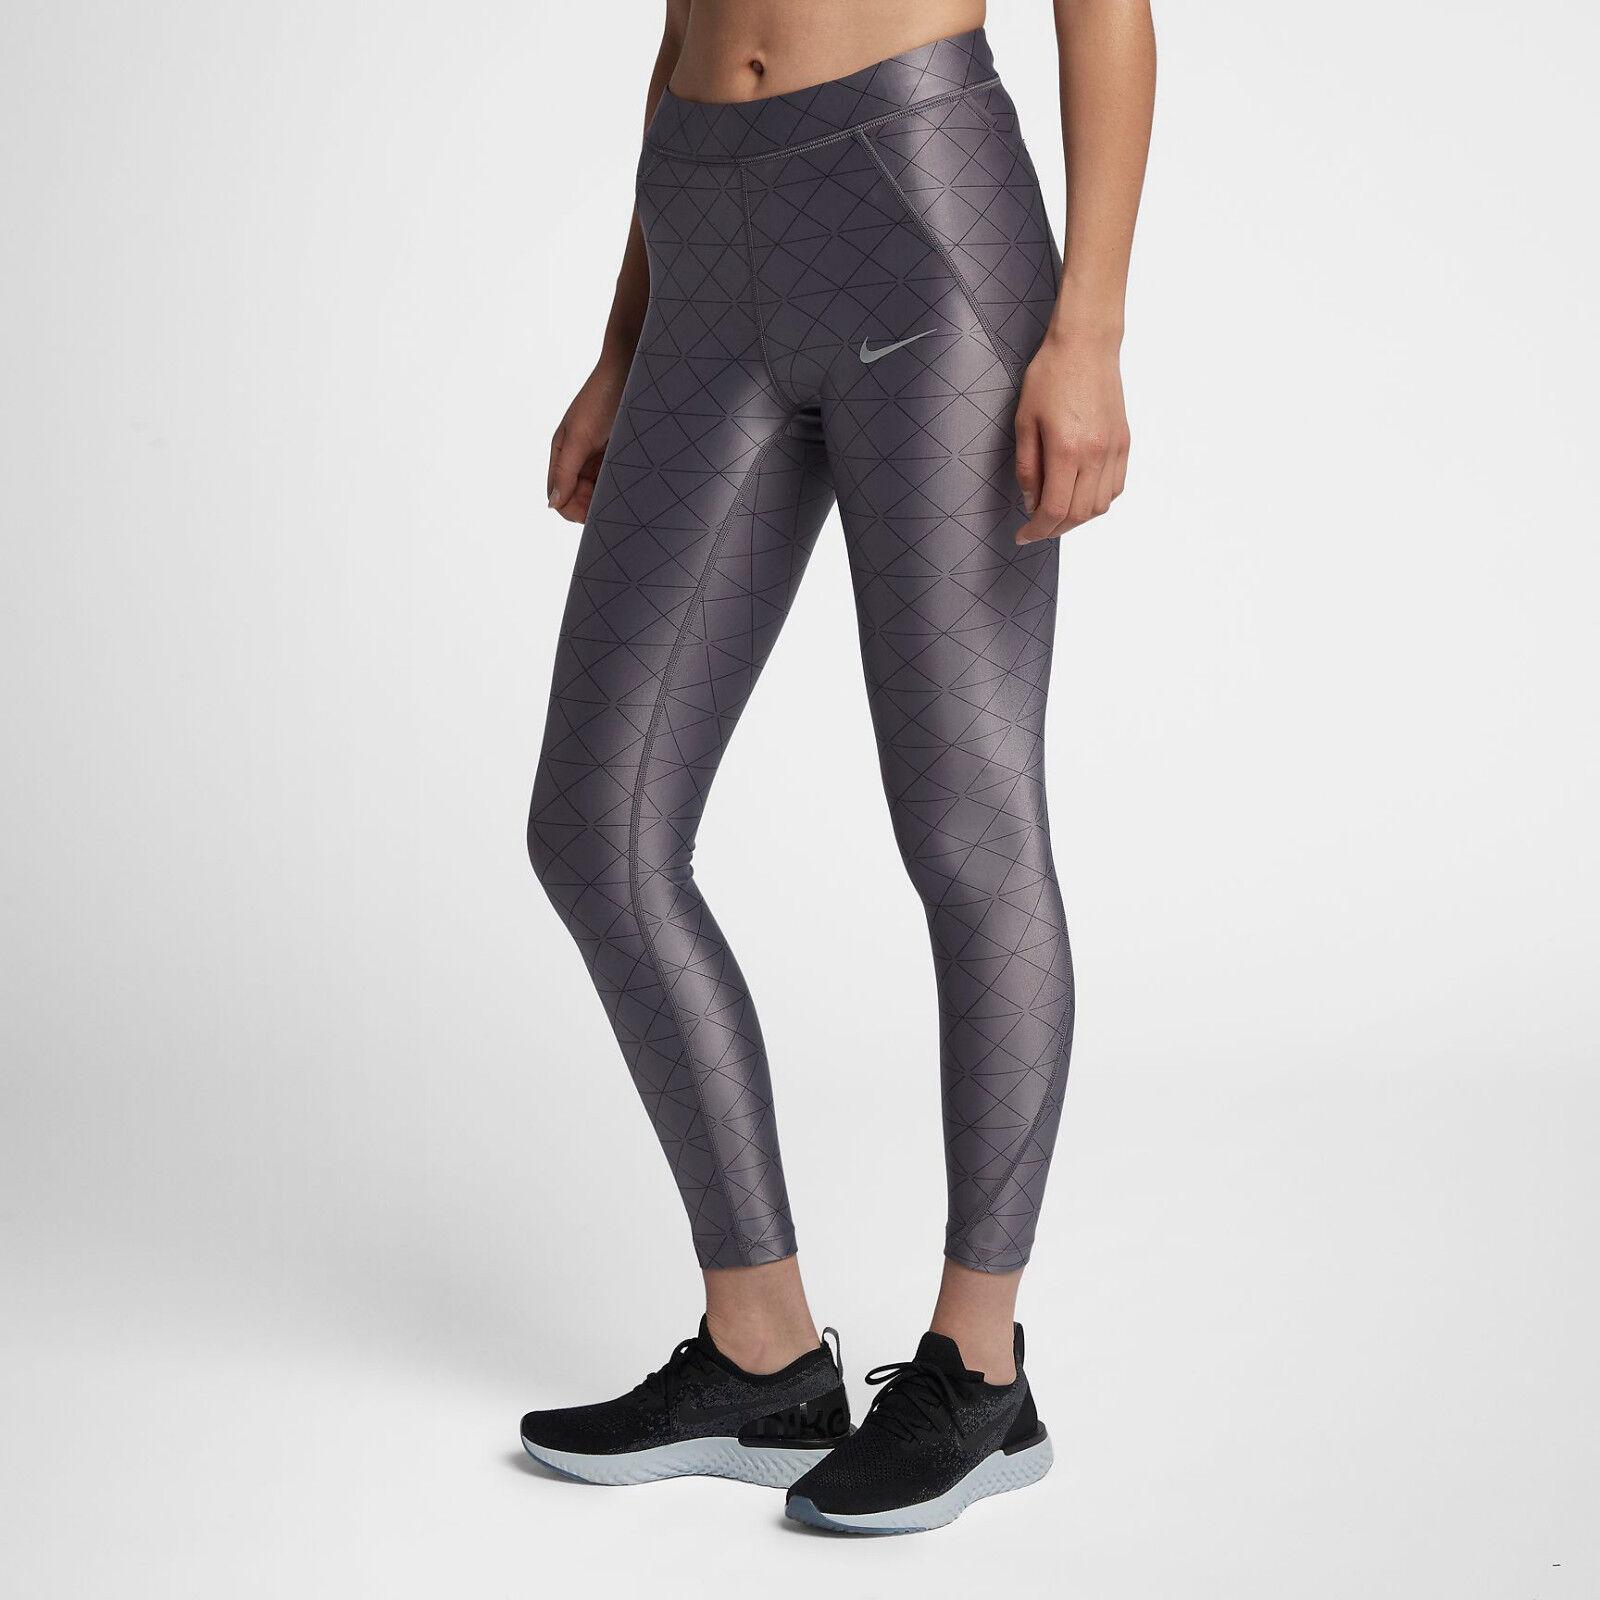 Nike Speed Donna 63.5cm Collant da da da Corsa Riflettente Gym Training f9a54b